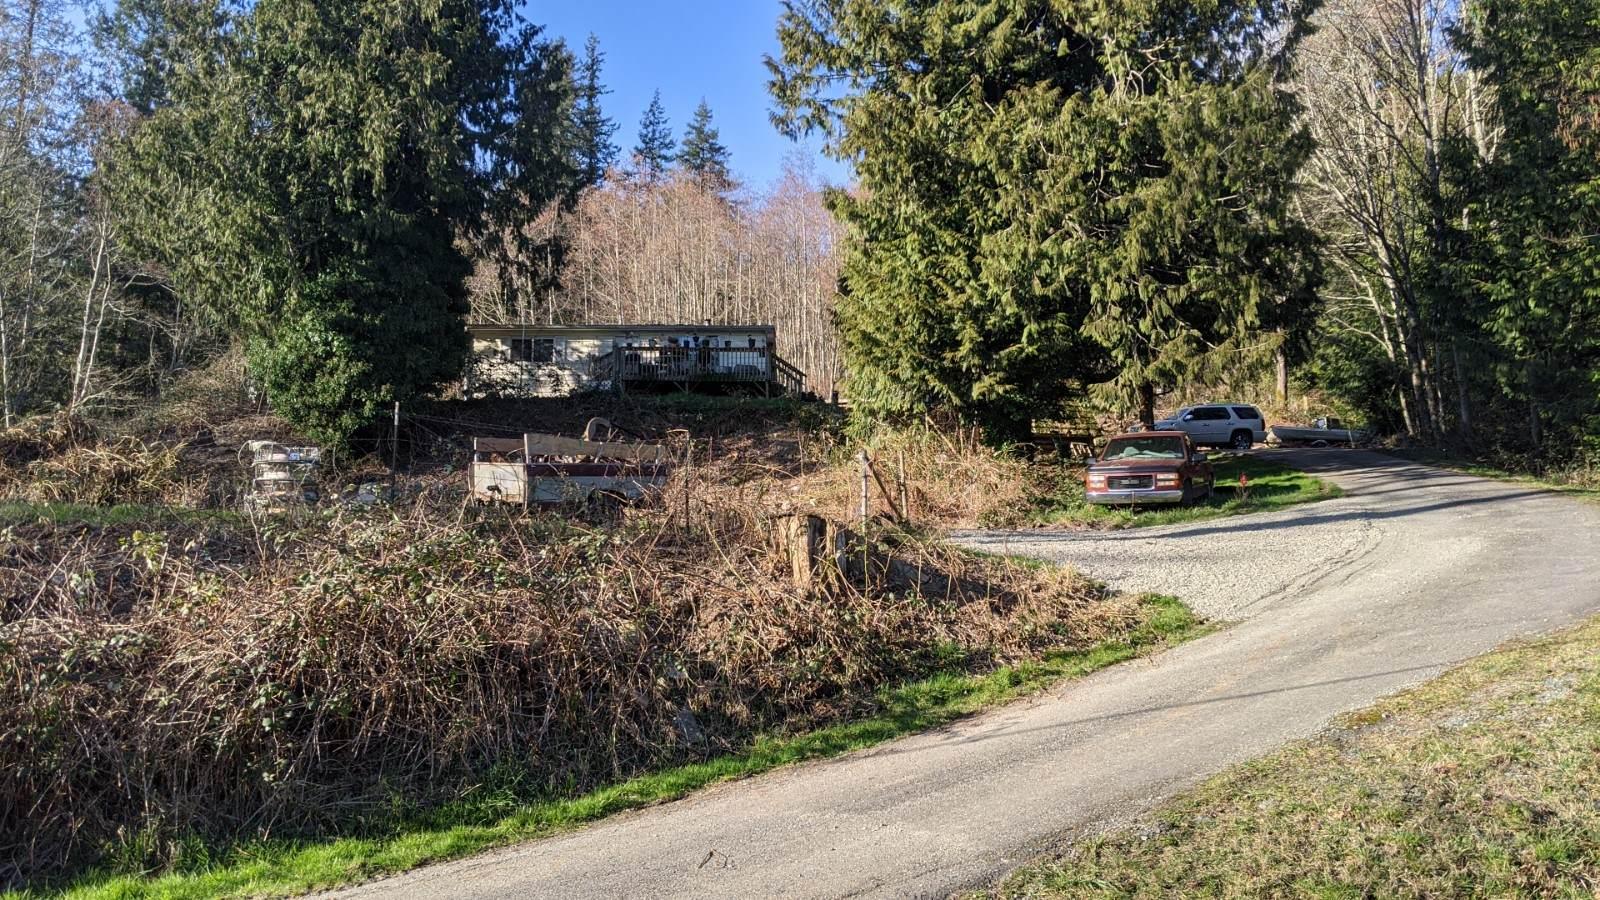 24903 Old Day Creek Road, Sedro Woolley, Washington 98284, 2 Bedrooms Bedrooms, ,2 BathroomsBathrooms,Residential,For Sale,24903 Old Day Creek Road,1744639